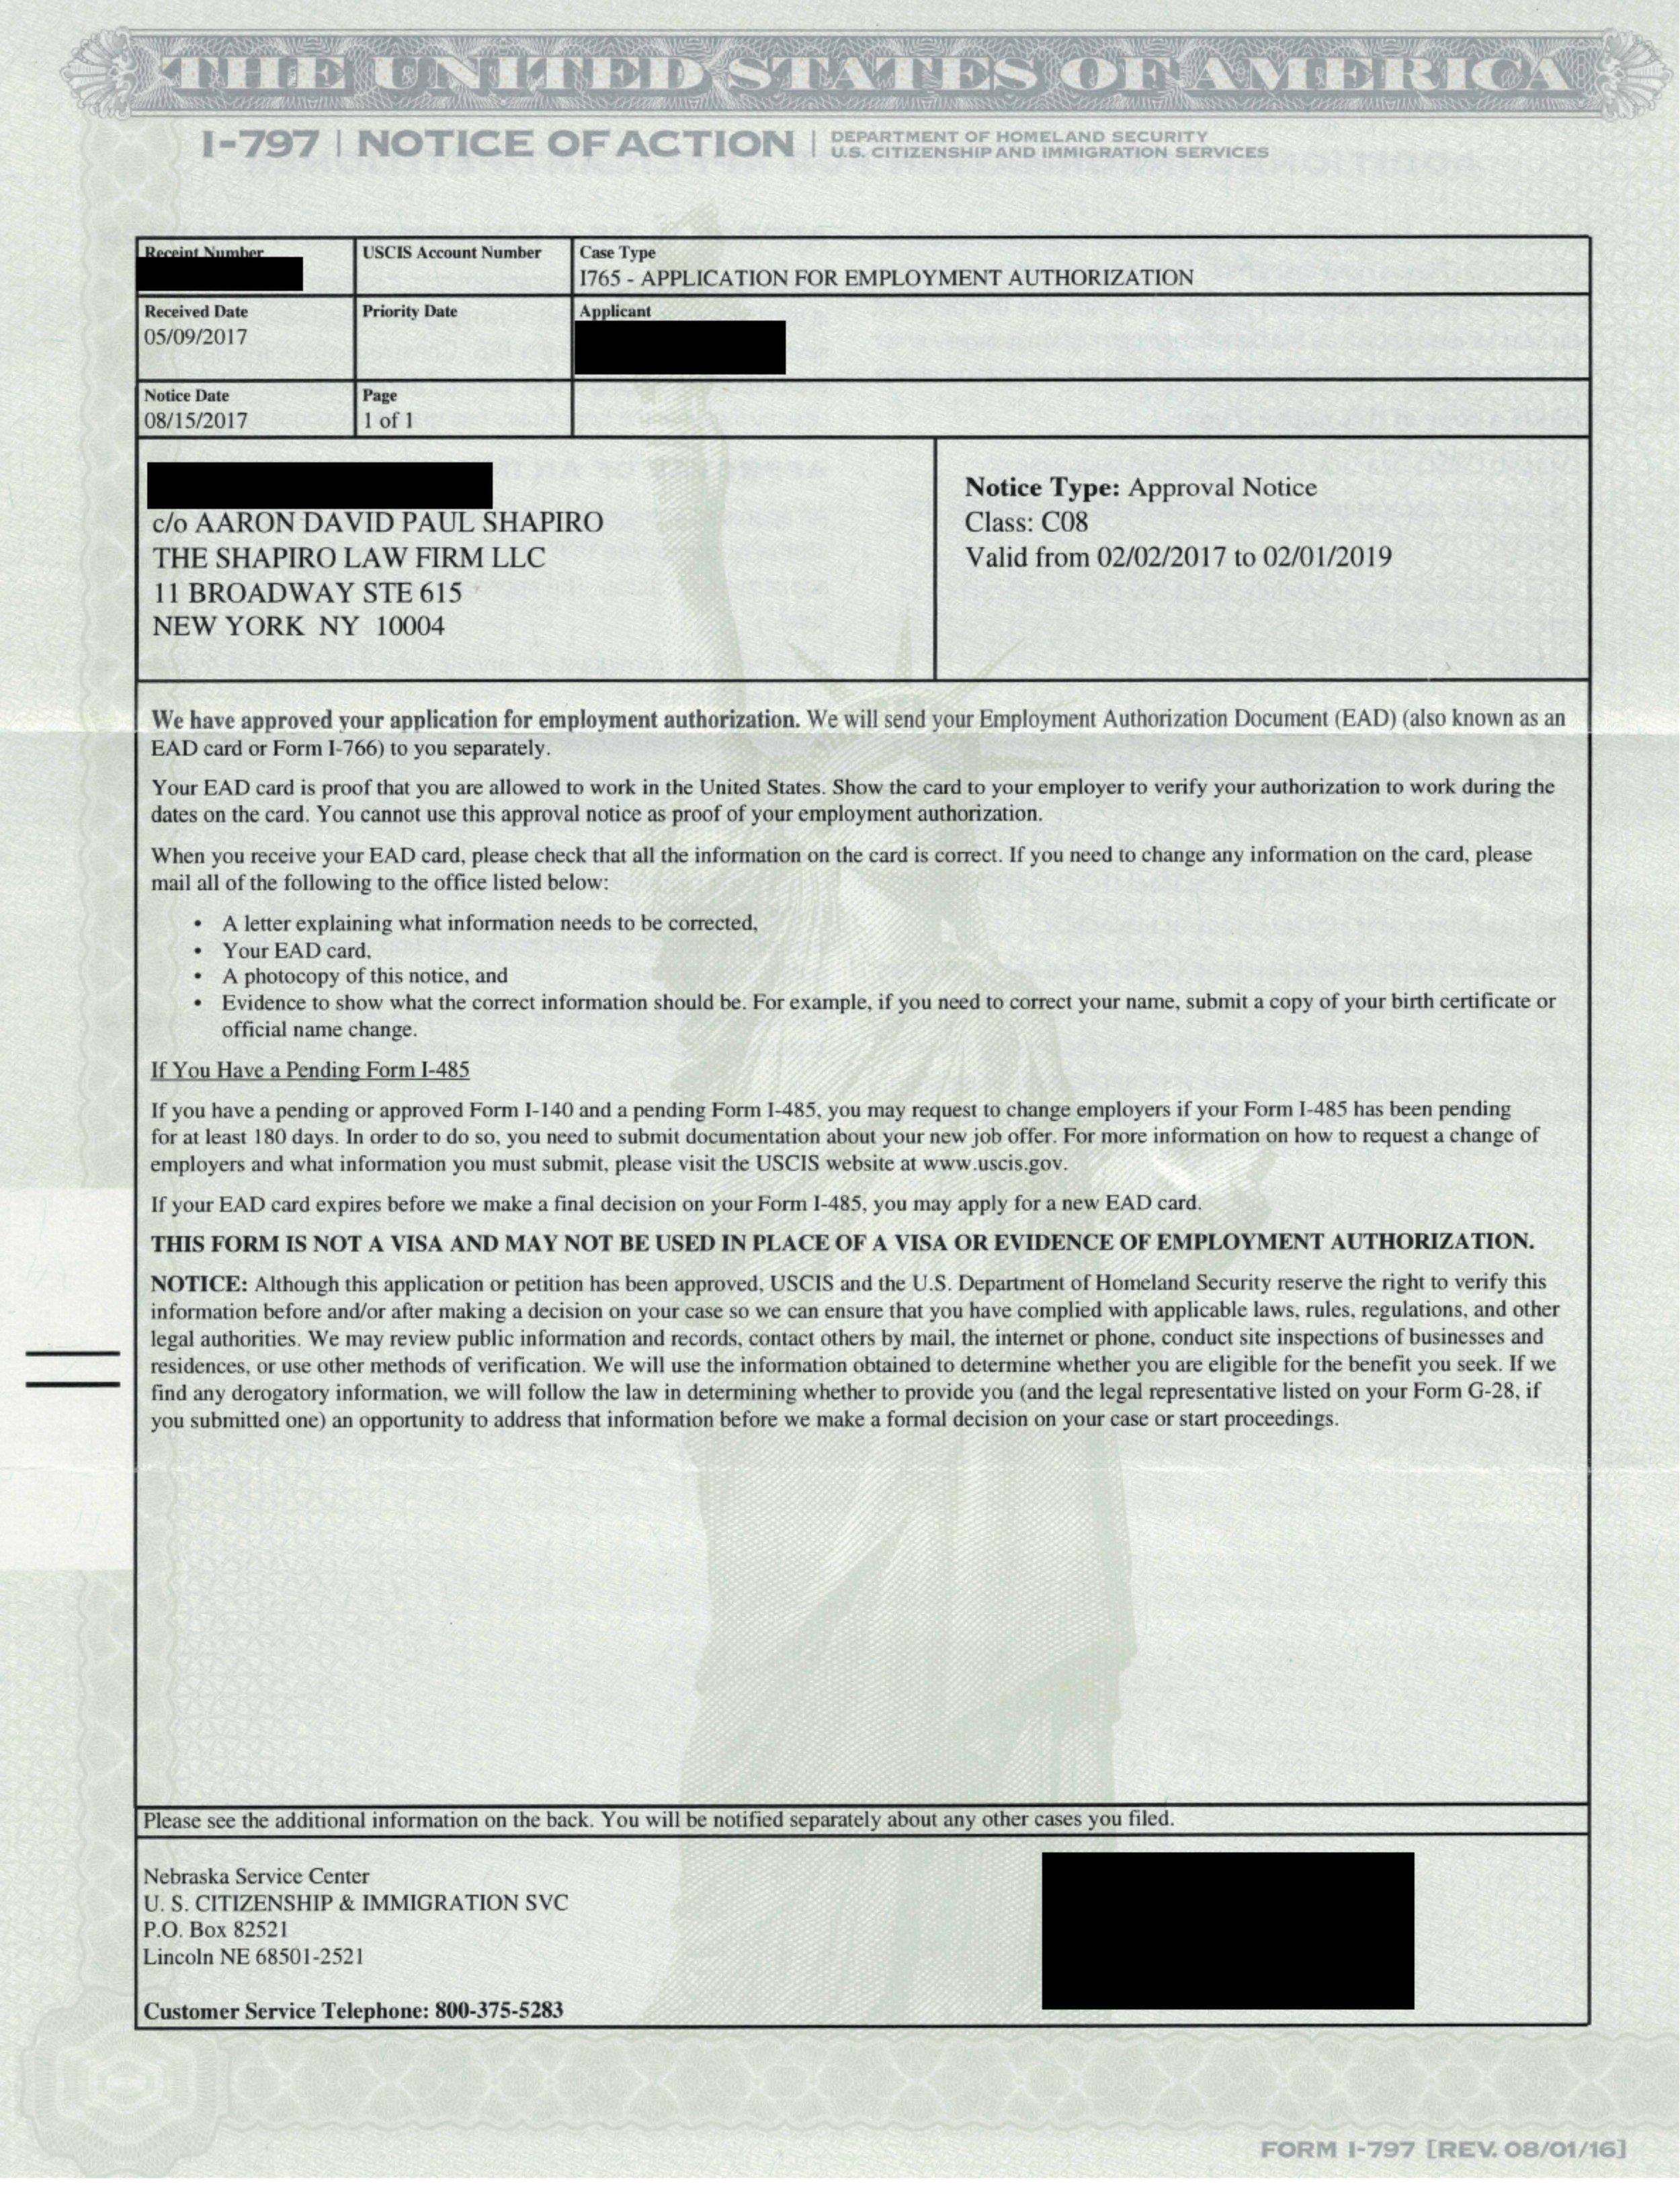 Form I-797C, I-765 Approval Notice